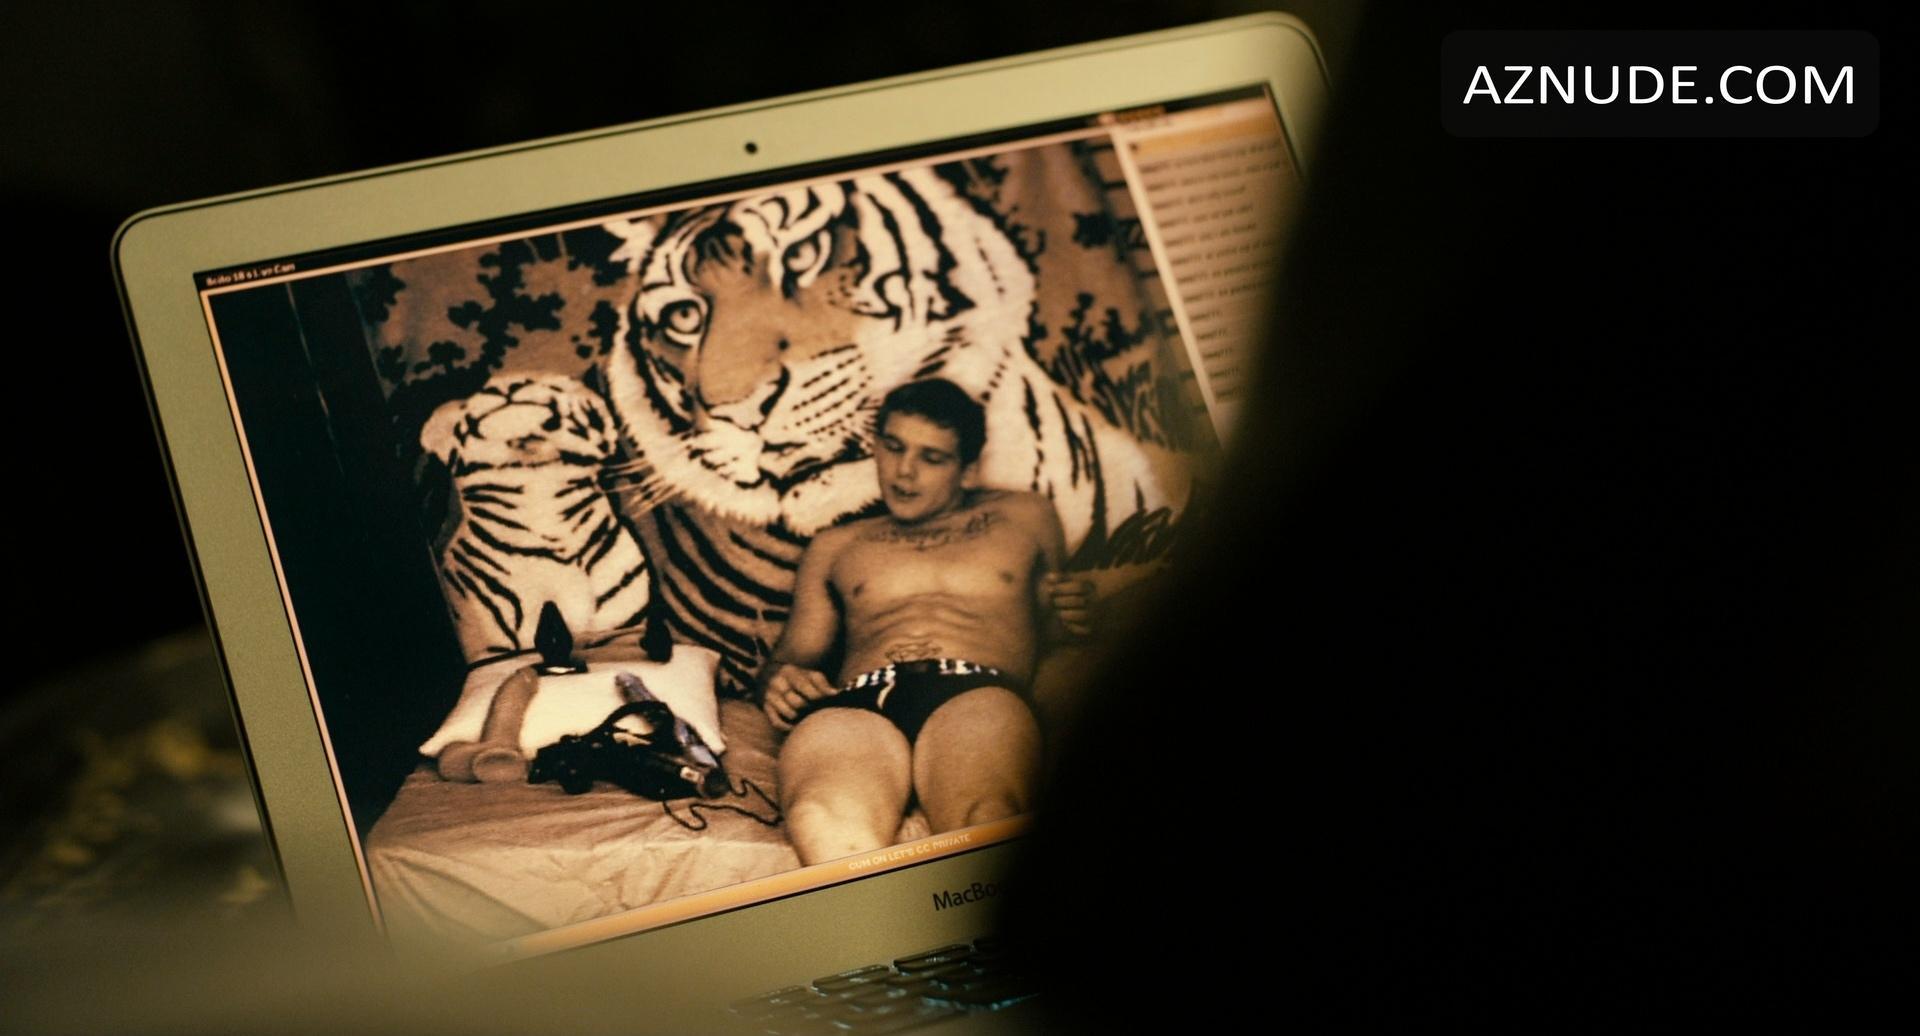 Max thieriot nude photos